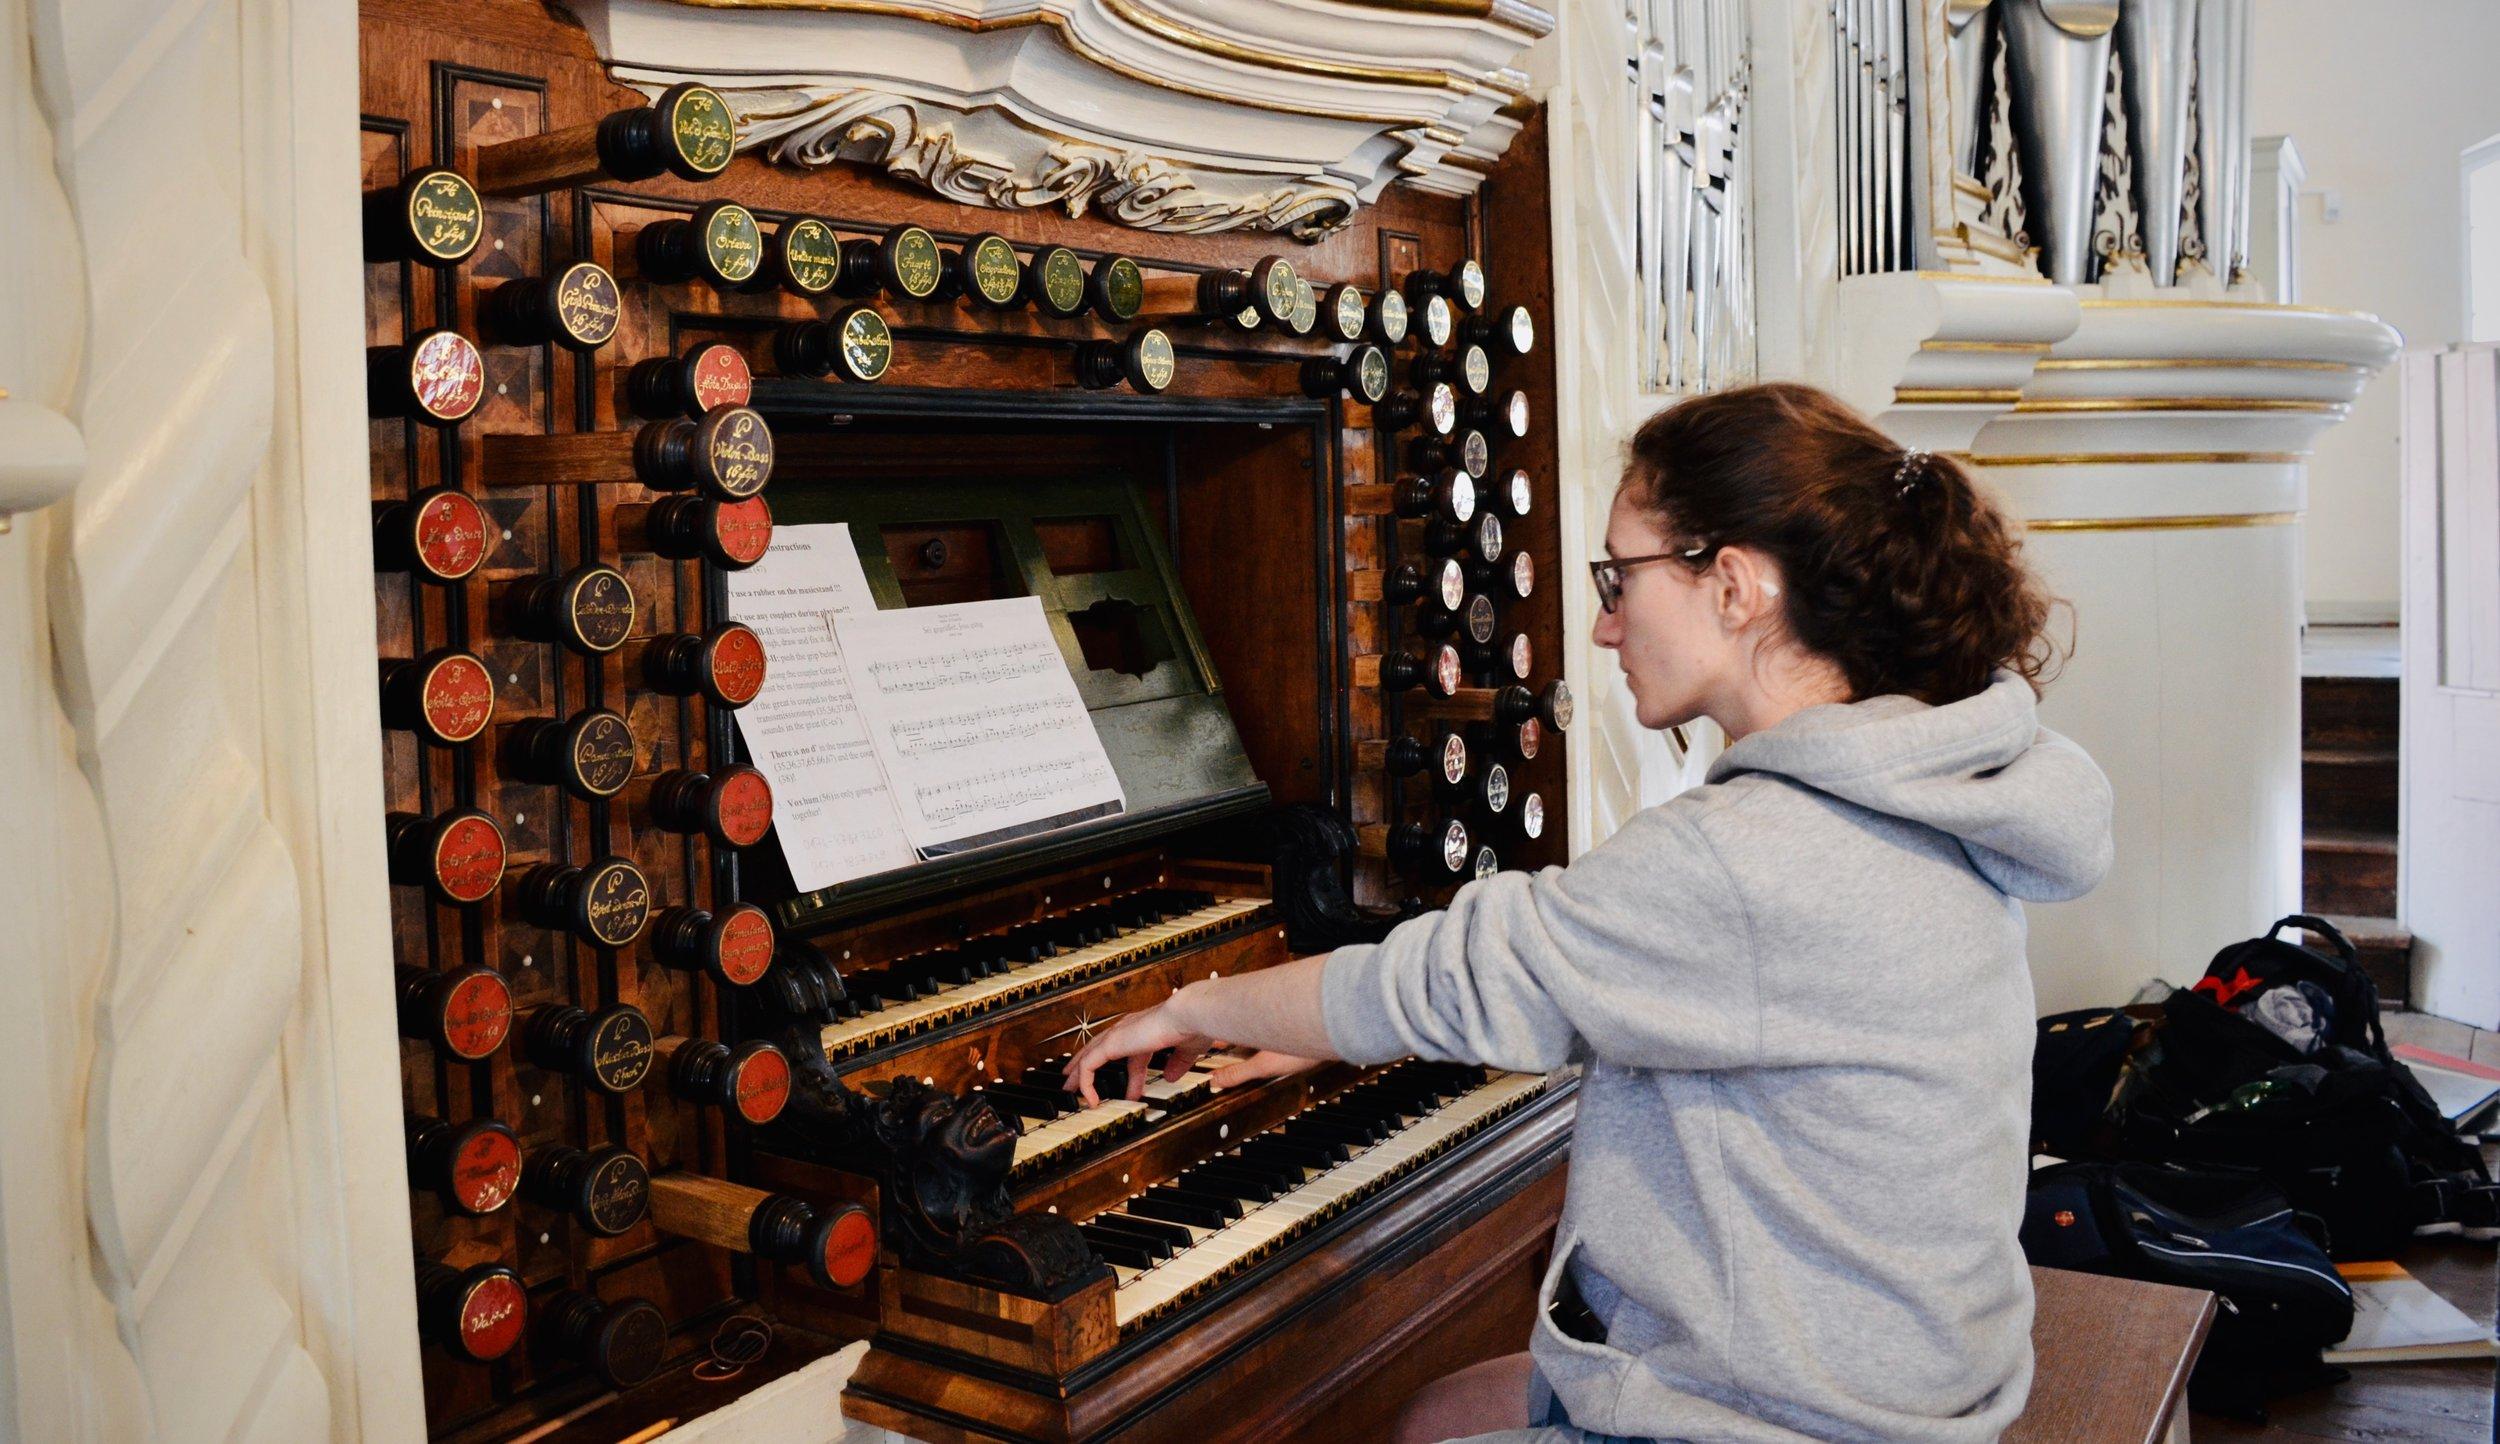 Rosemarie Tougas plays the 1730 Trost Organ, Stadtkirche, Waltershausen.